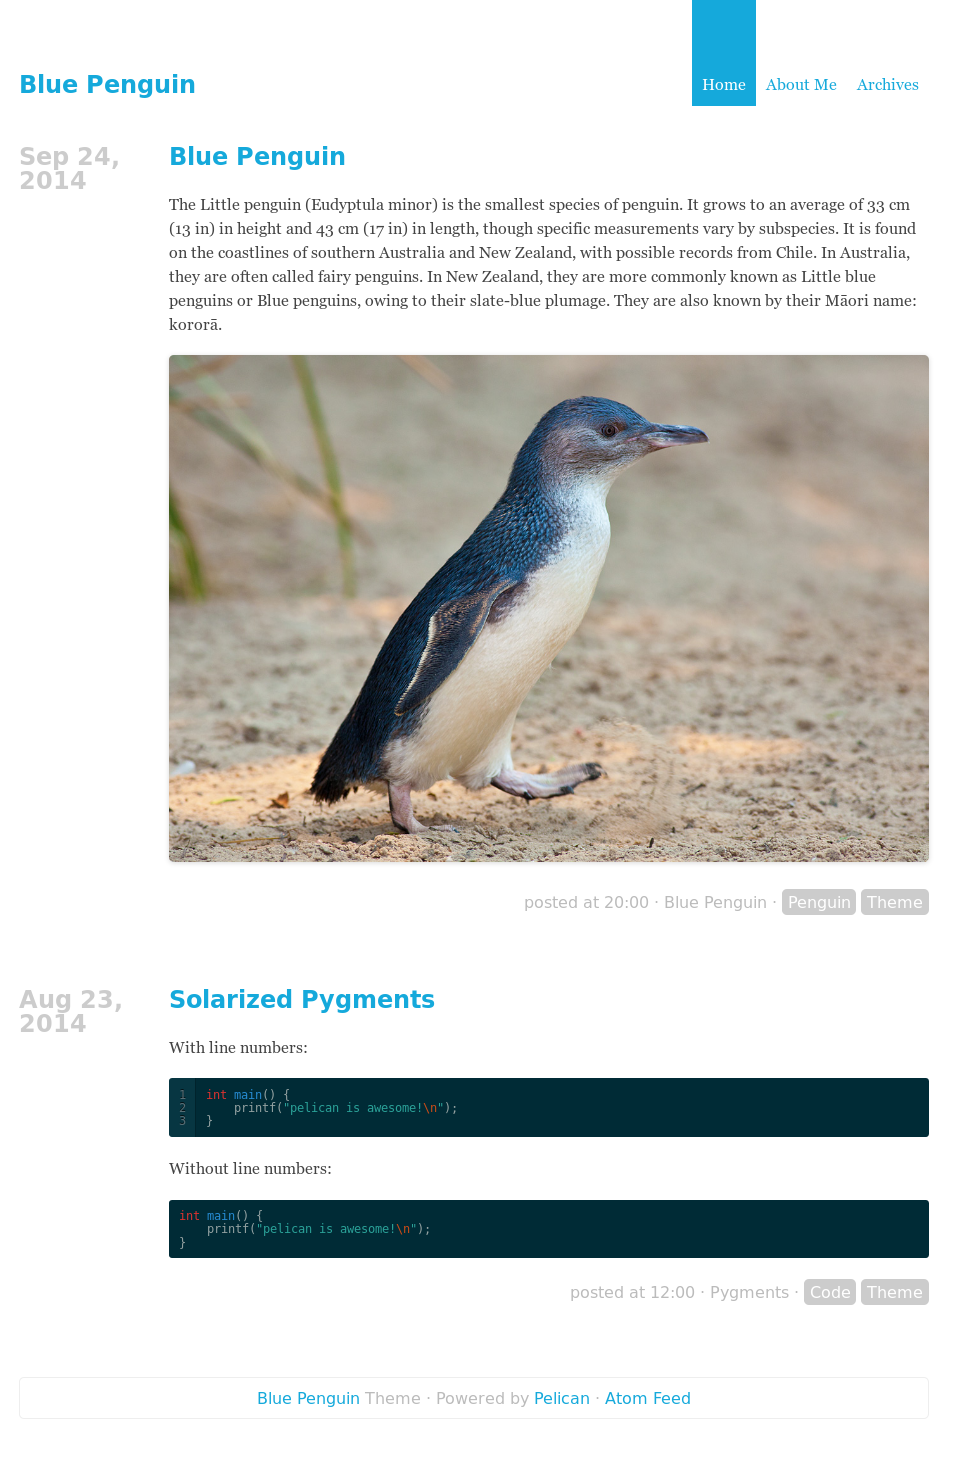 blue-penguin tema para Pelican